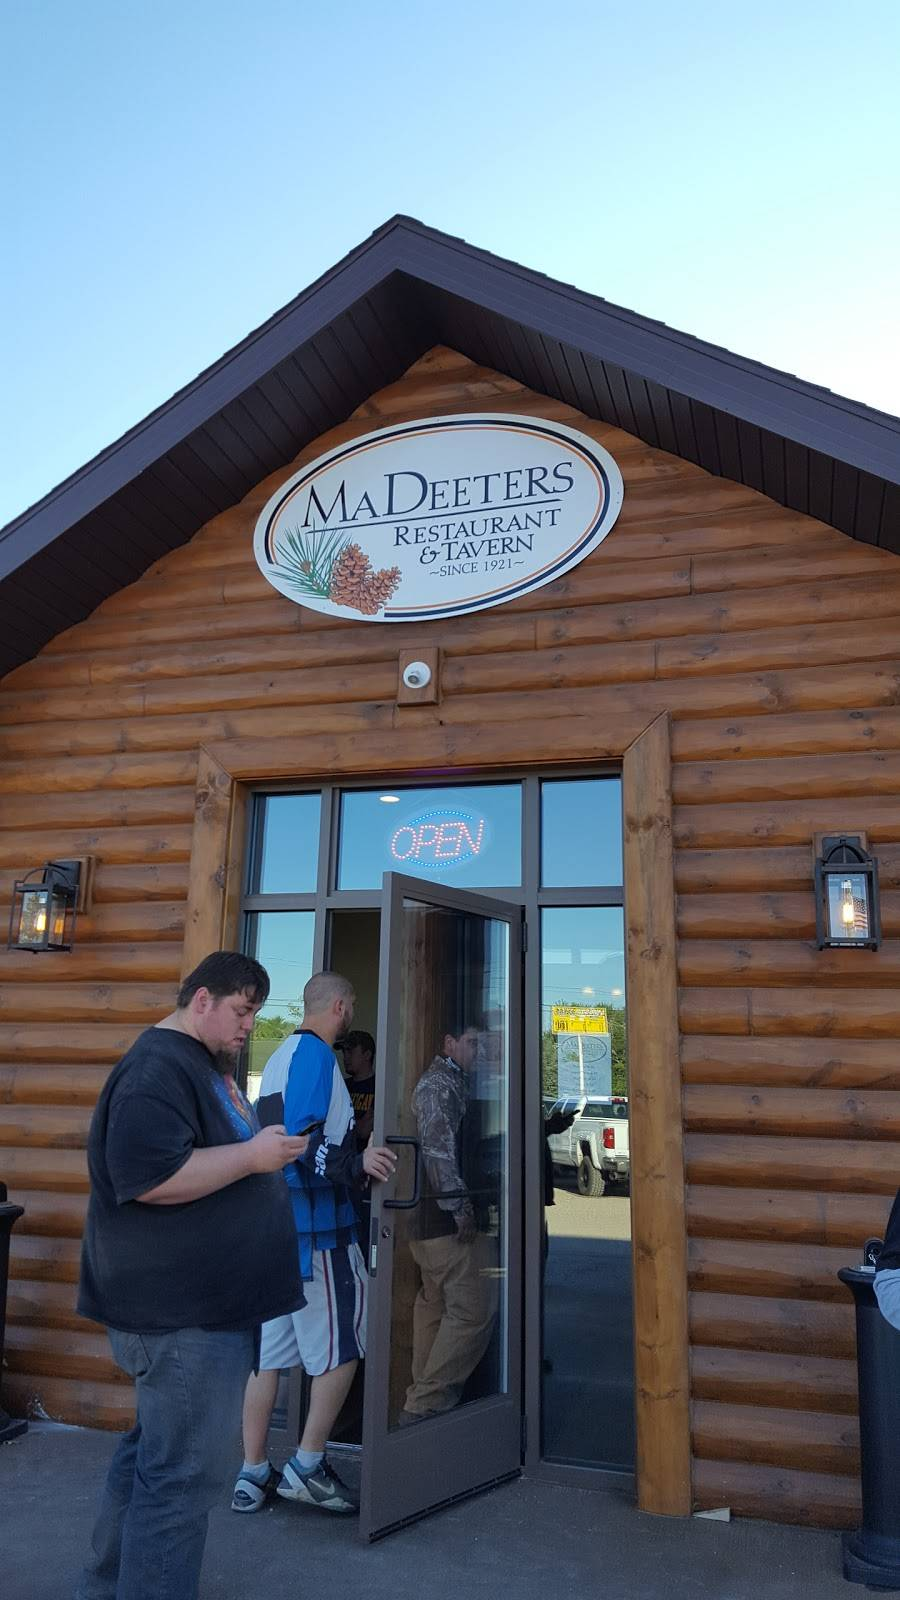 Ma Deeters | restaurant | 2262 Deeter Rd, Luzerne, MI 48636, USA | 9898261013 OR +1 989-826-1013